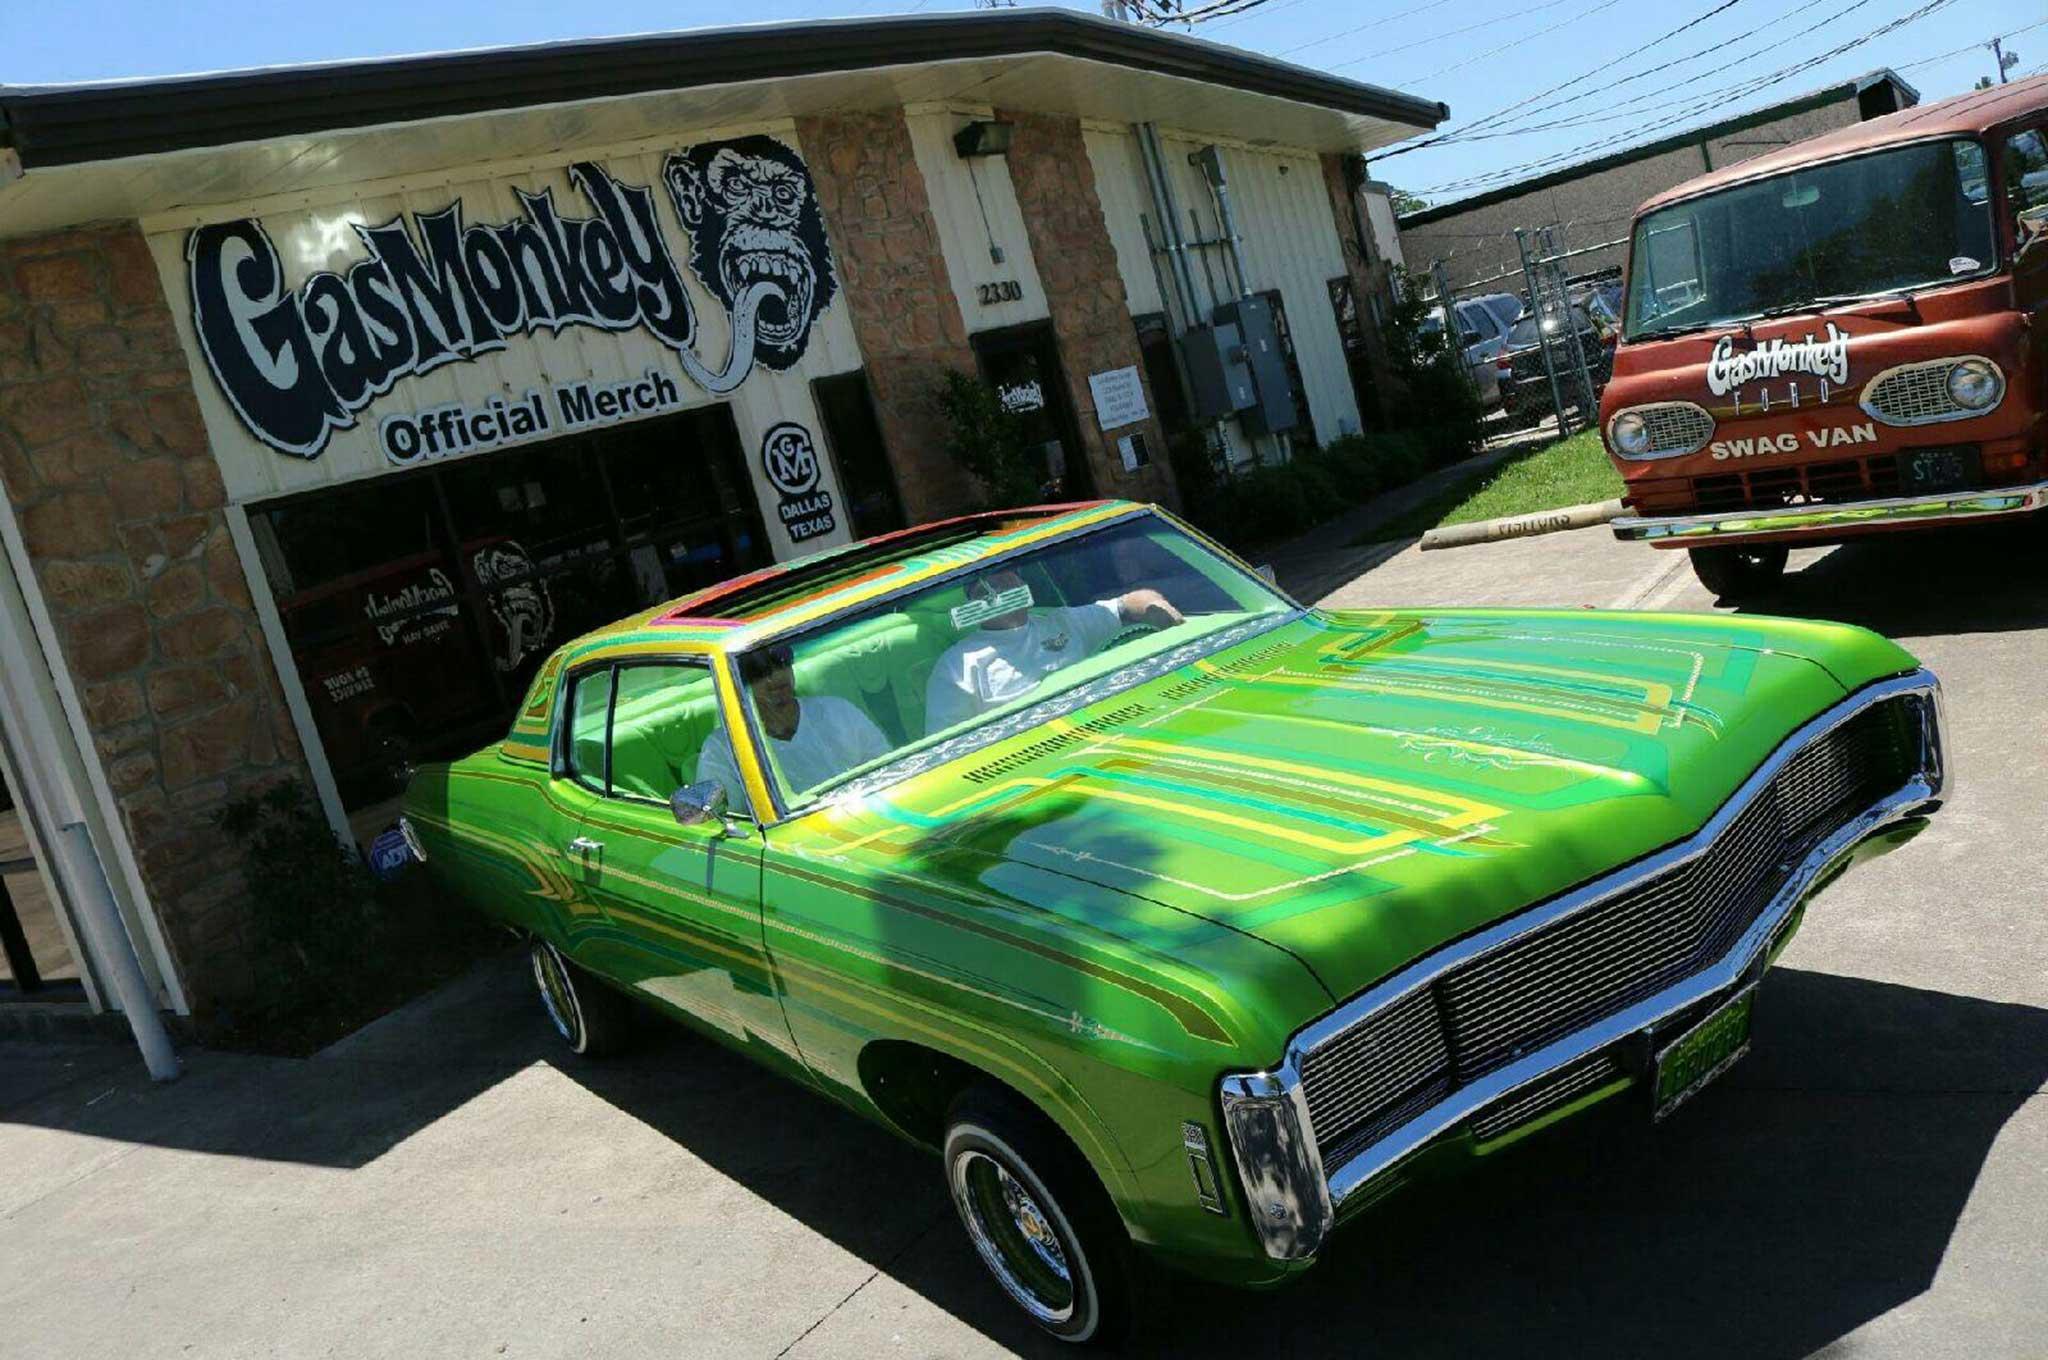 Coast To Coast Chevrolet Impala Miami Lowrider Super Show Gas - Gas monkey car show